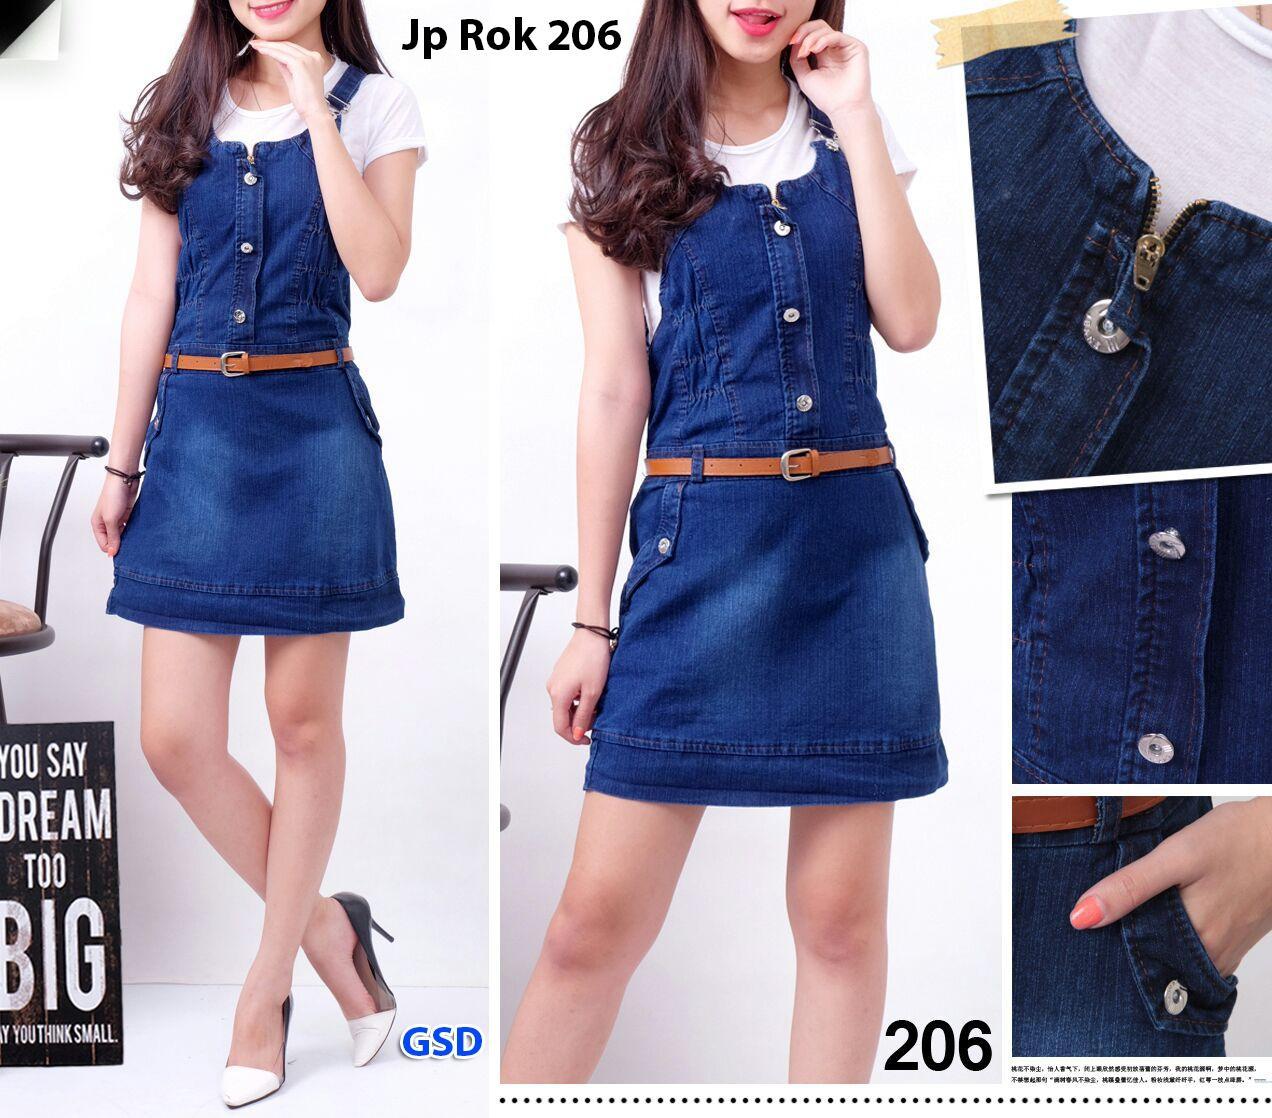 GSD - Dress Jeans Wanita / Baju Jeans Wanita / Baju Kodok Wanita - Rok Jeans 201